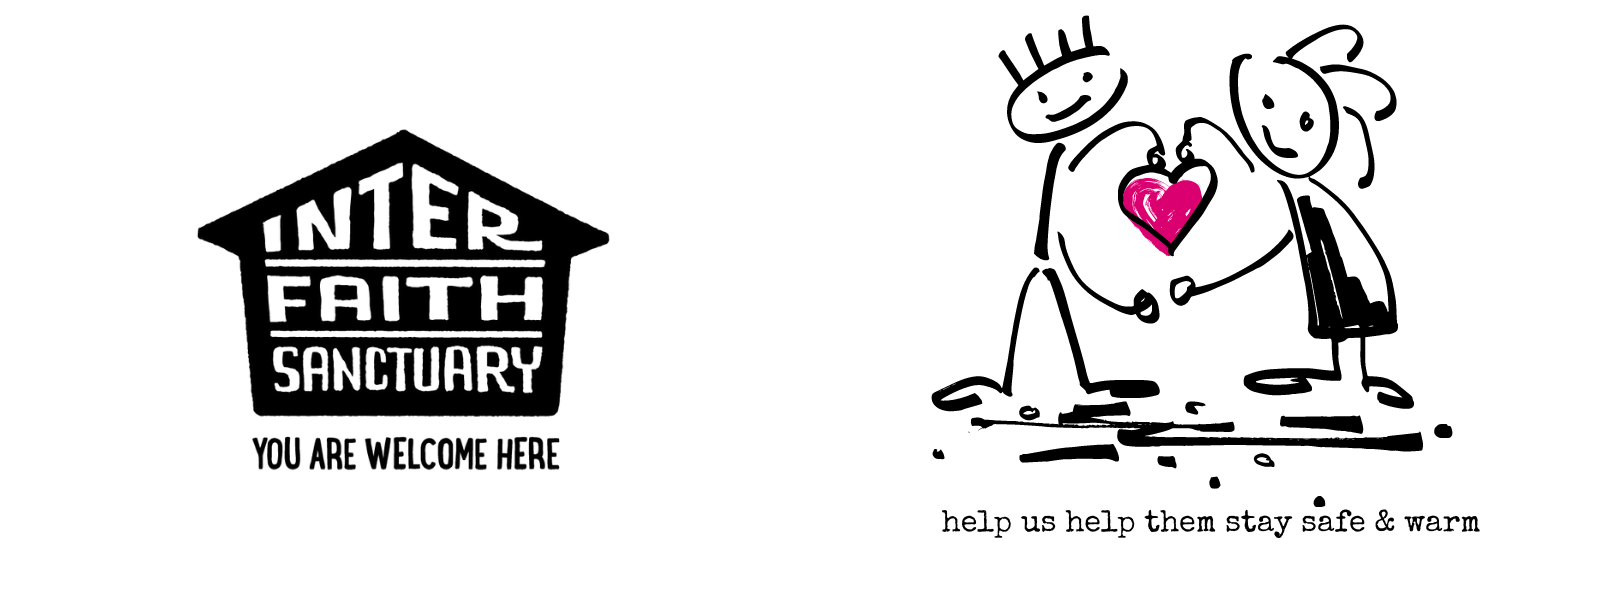 Help Us Help Them! image